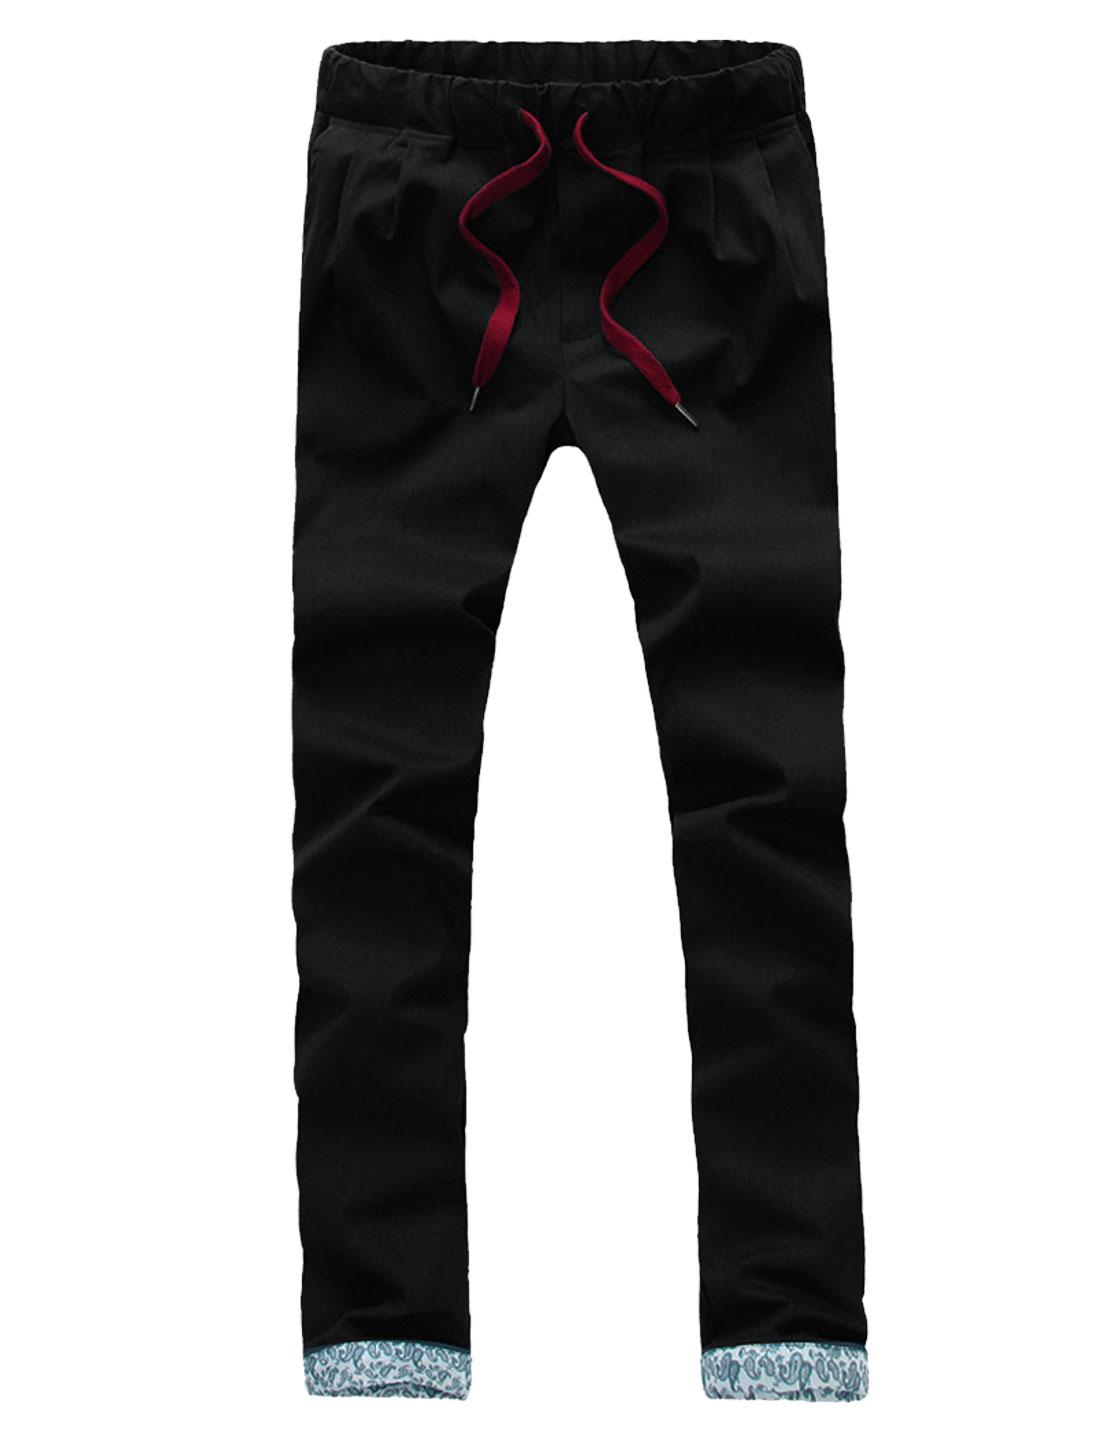 Men Mid Rise Elastic Waist Drawstring Front Pockets Casual Pants Black W32